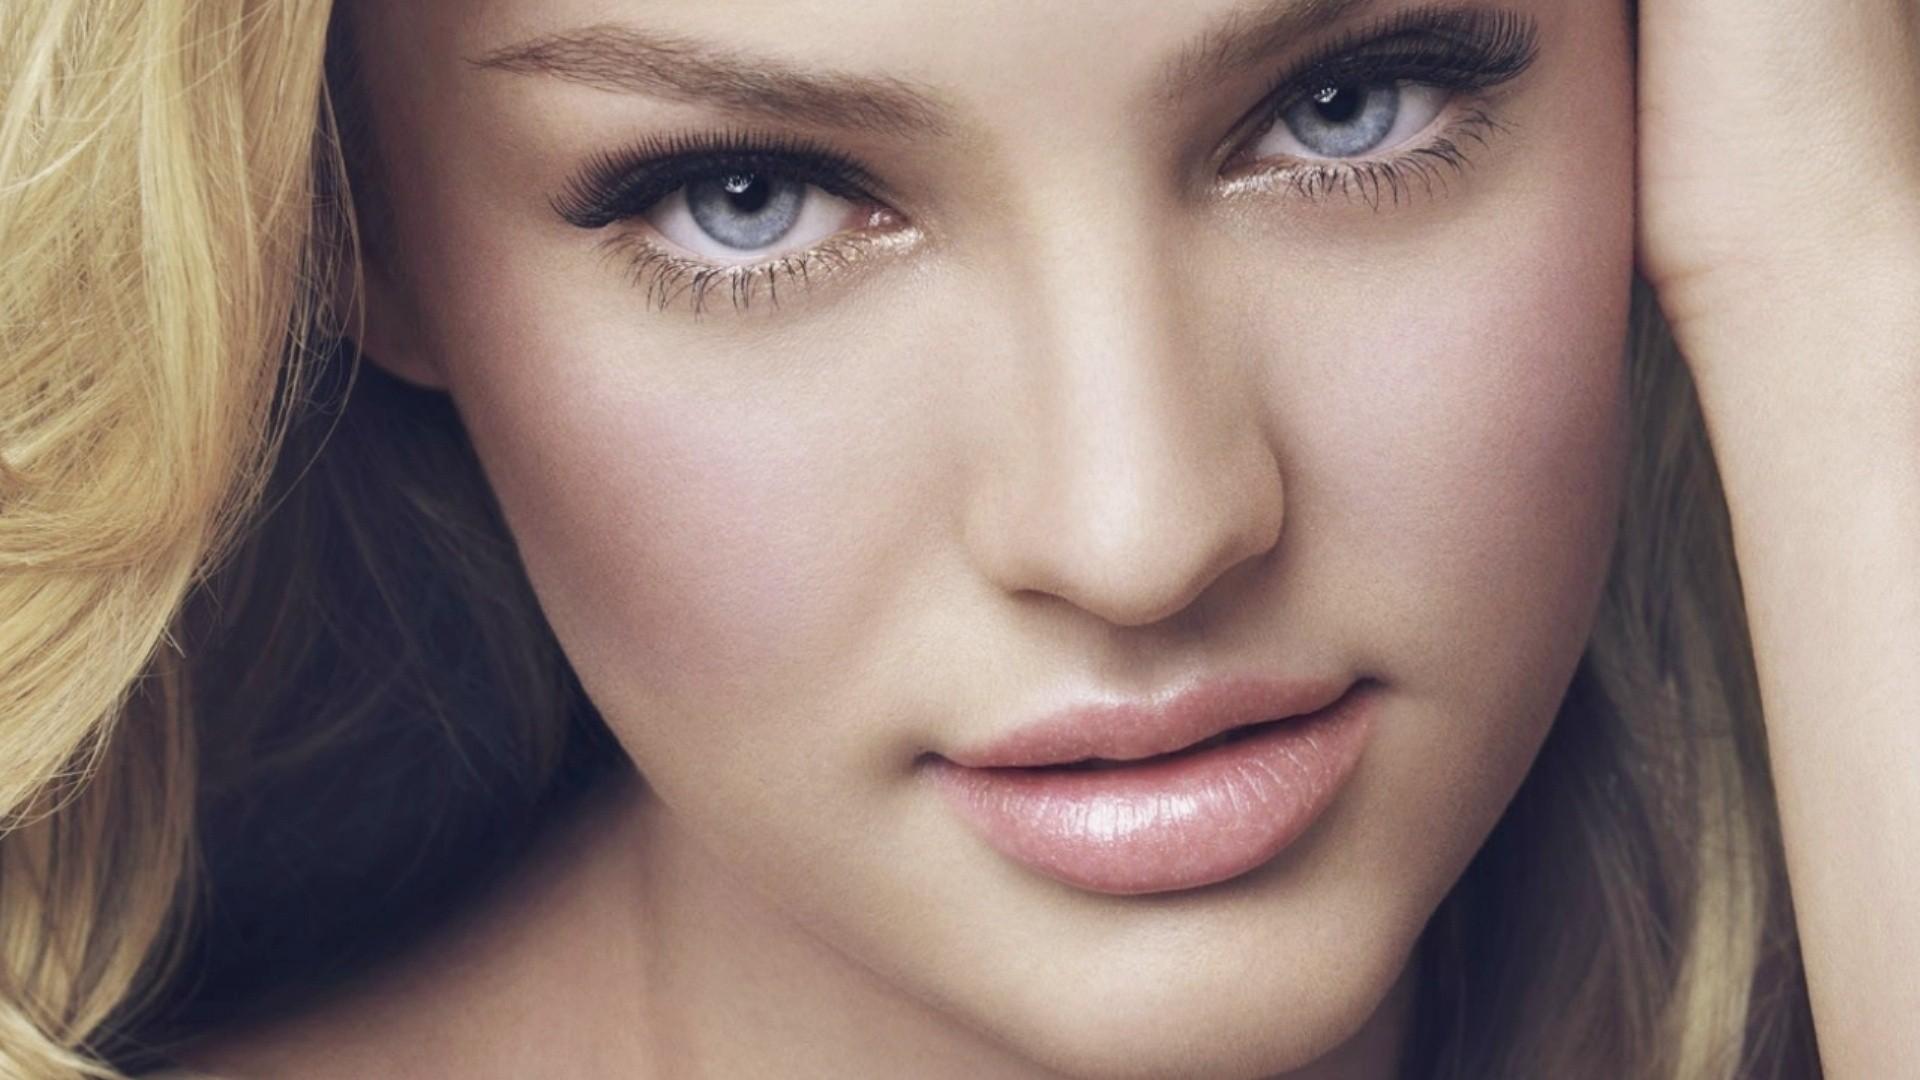 Beautiful Girl Face HD Wallpaper – Free wallpaper download